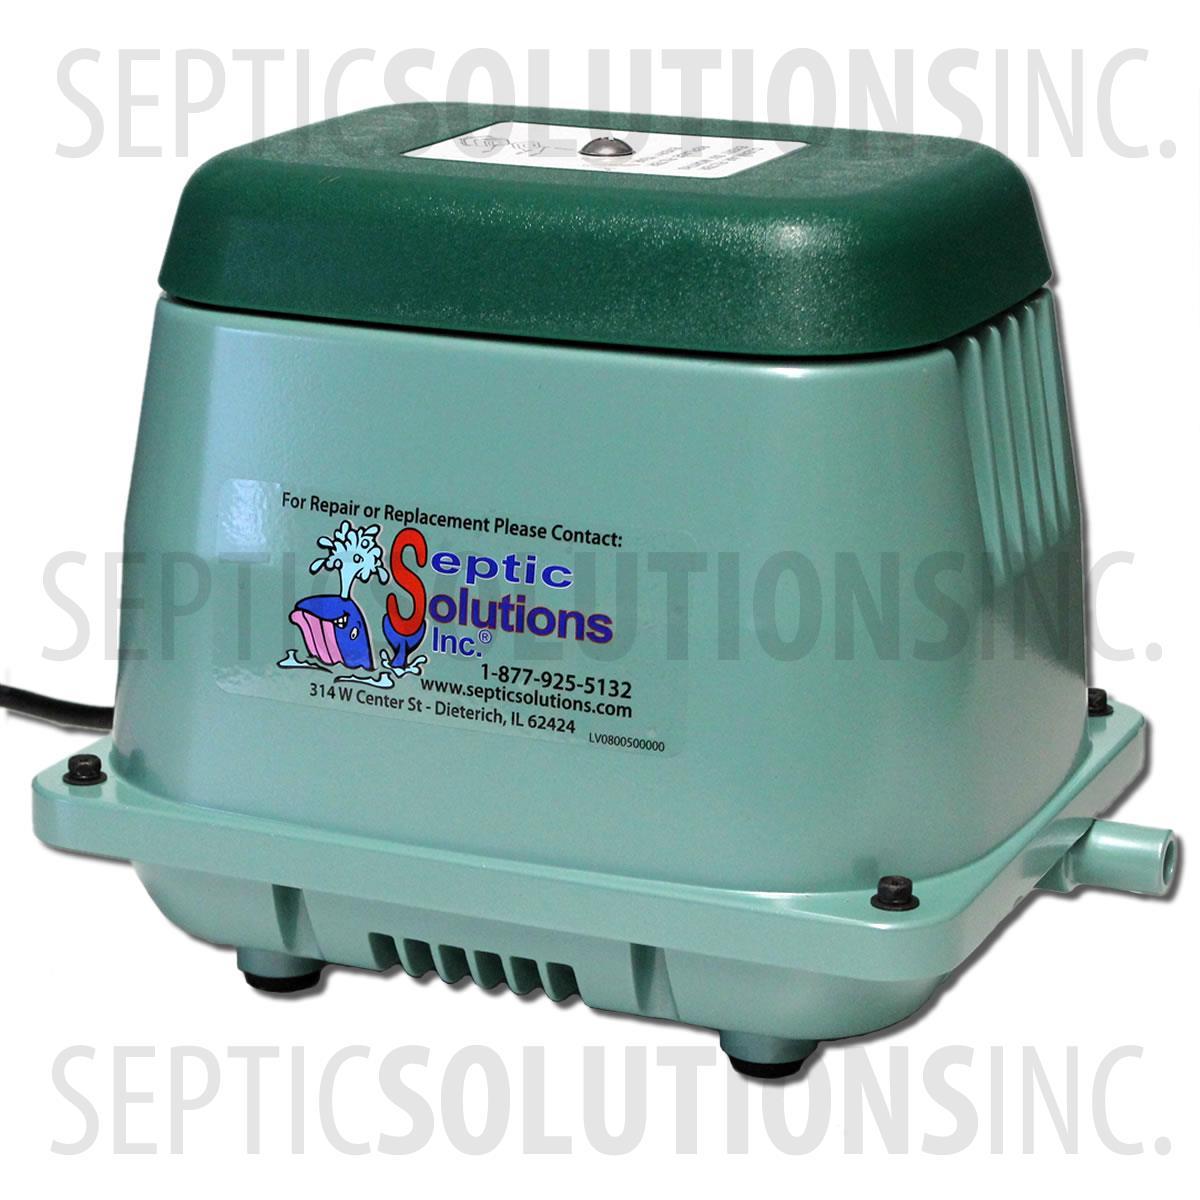 Nayadic Alternative 800 Gpd Linear Septic Air Pump N800